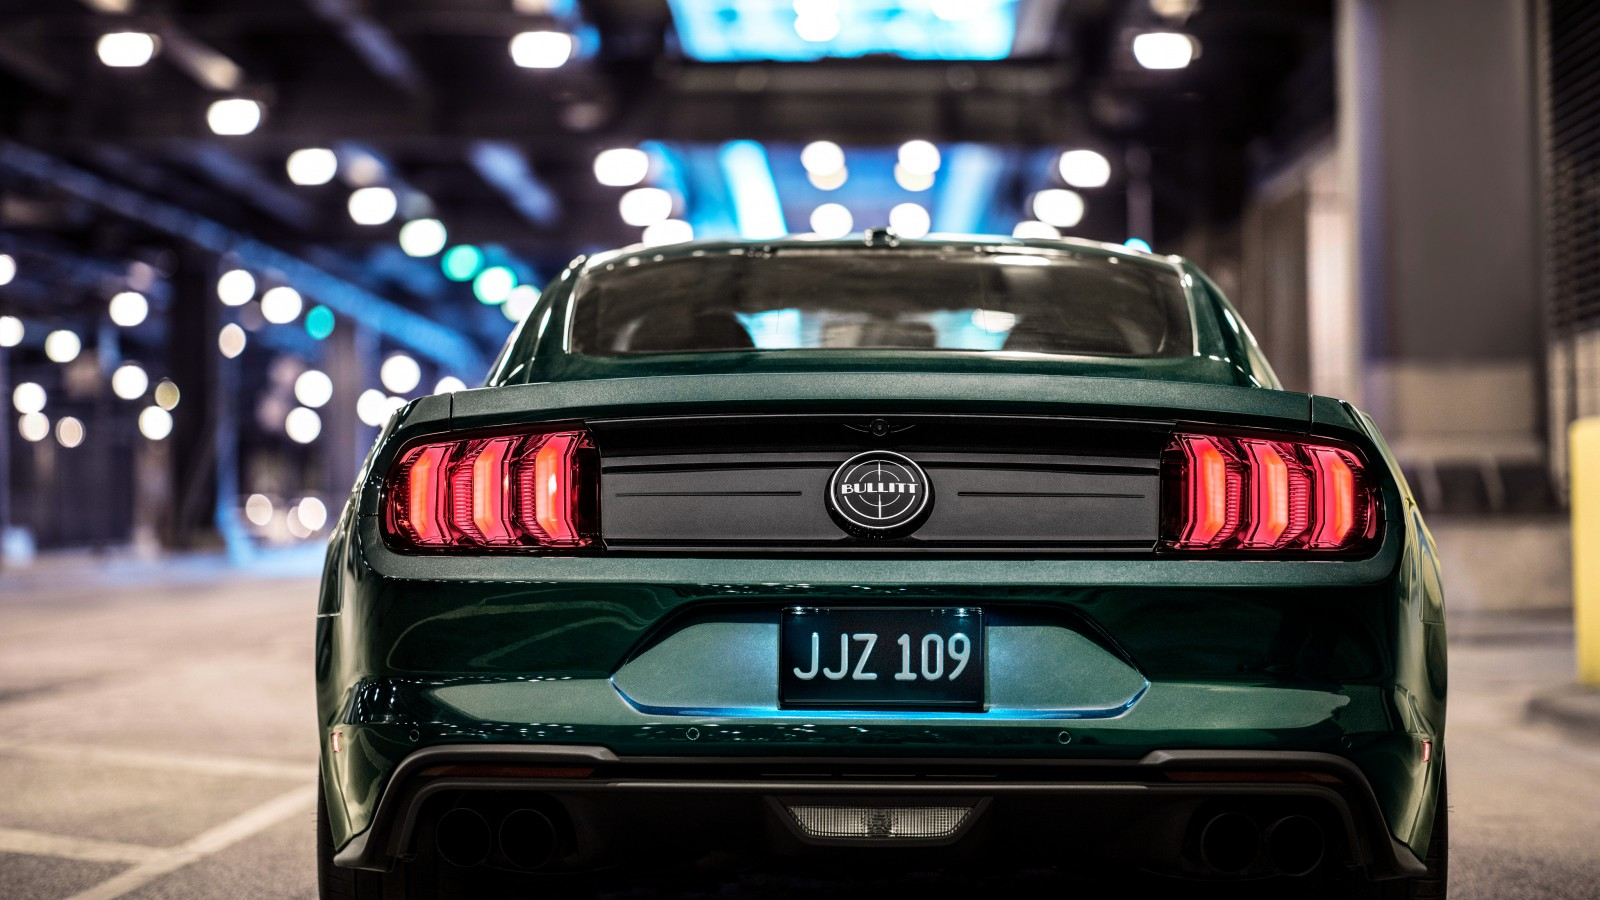 2015 Mustang Wheels >> 2018 Ford Mustang Bullitt 4K 2 Wallpaper | HD Car ...